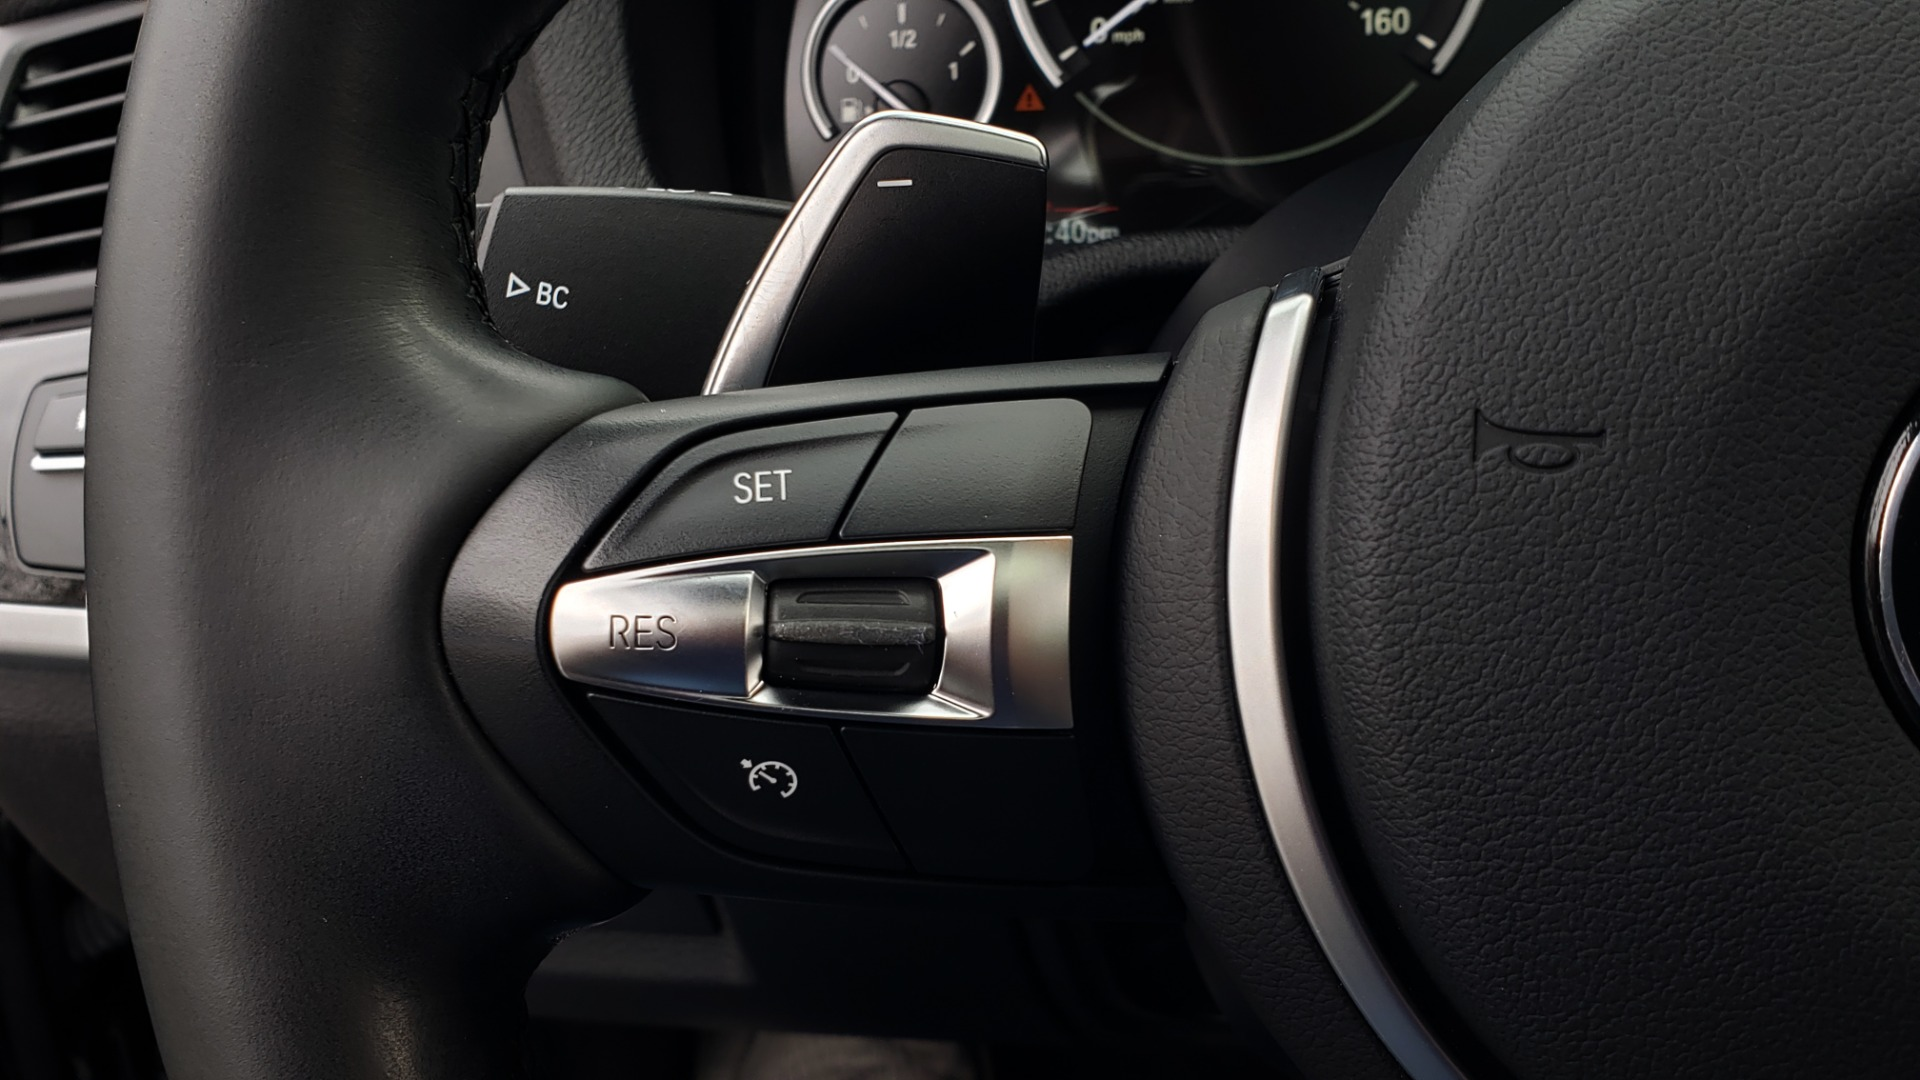 Used 2017 BMW X3 XDRIVE35I M-SPORT / DRVR ASST PLUS / TECHNOLOGY / HUD / BLIND SPOT for sale Sold at Formula Imports in Charlotte NC 28227 41